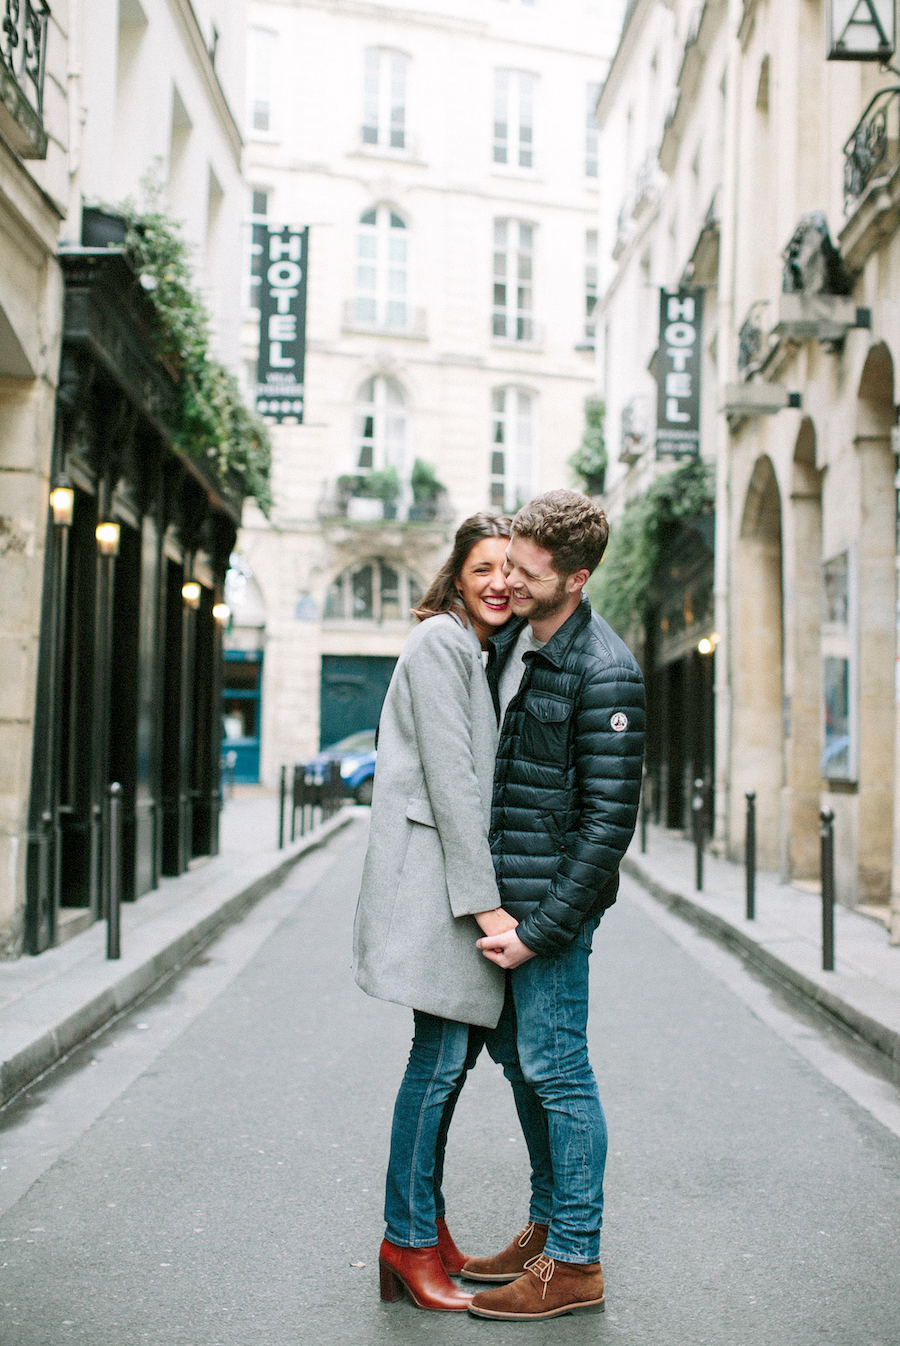 saya-photography-pre-wedding-couple-engagement-paris-quartier-latin-23.jpg